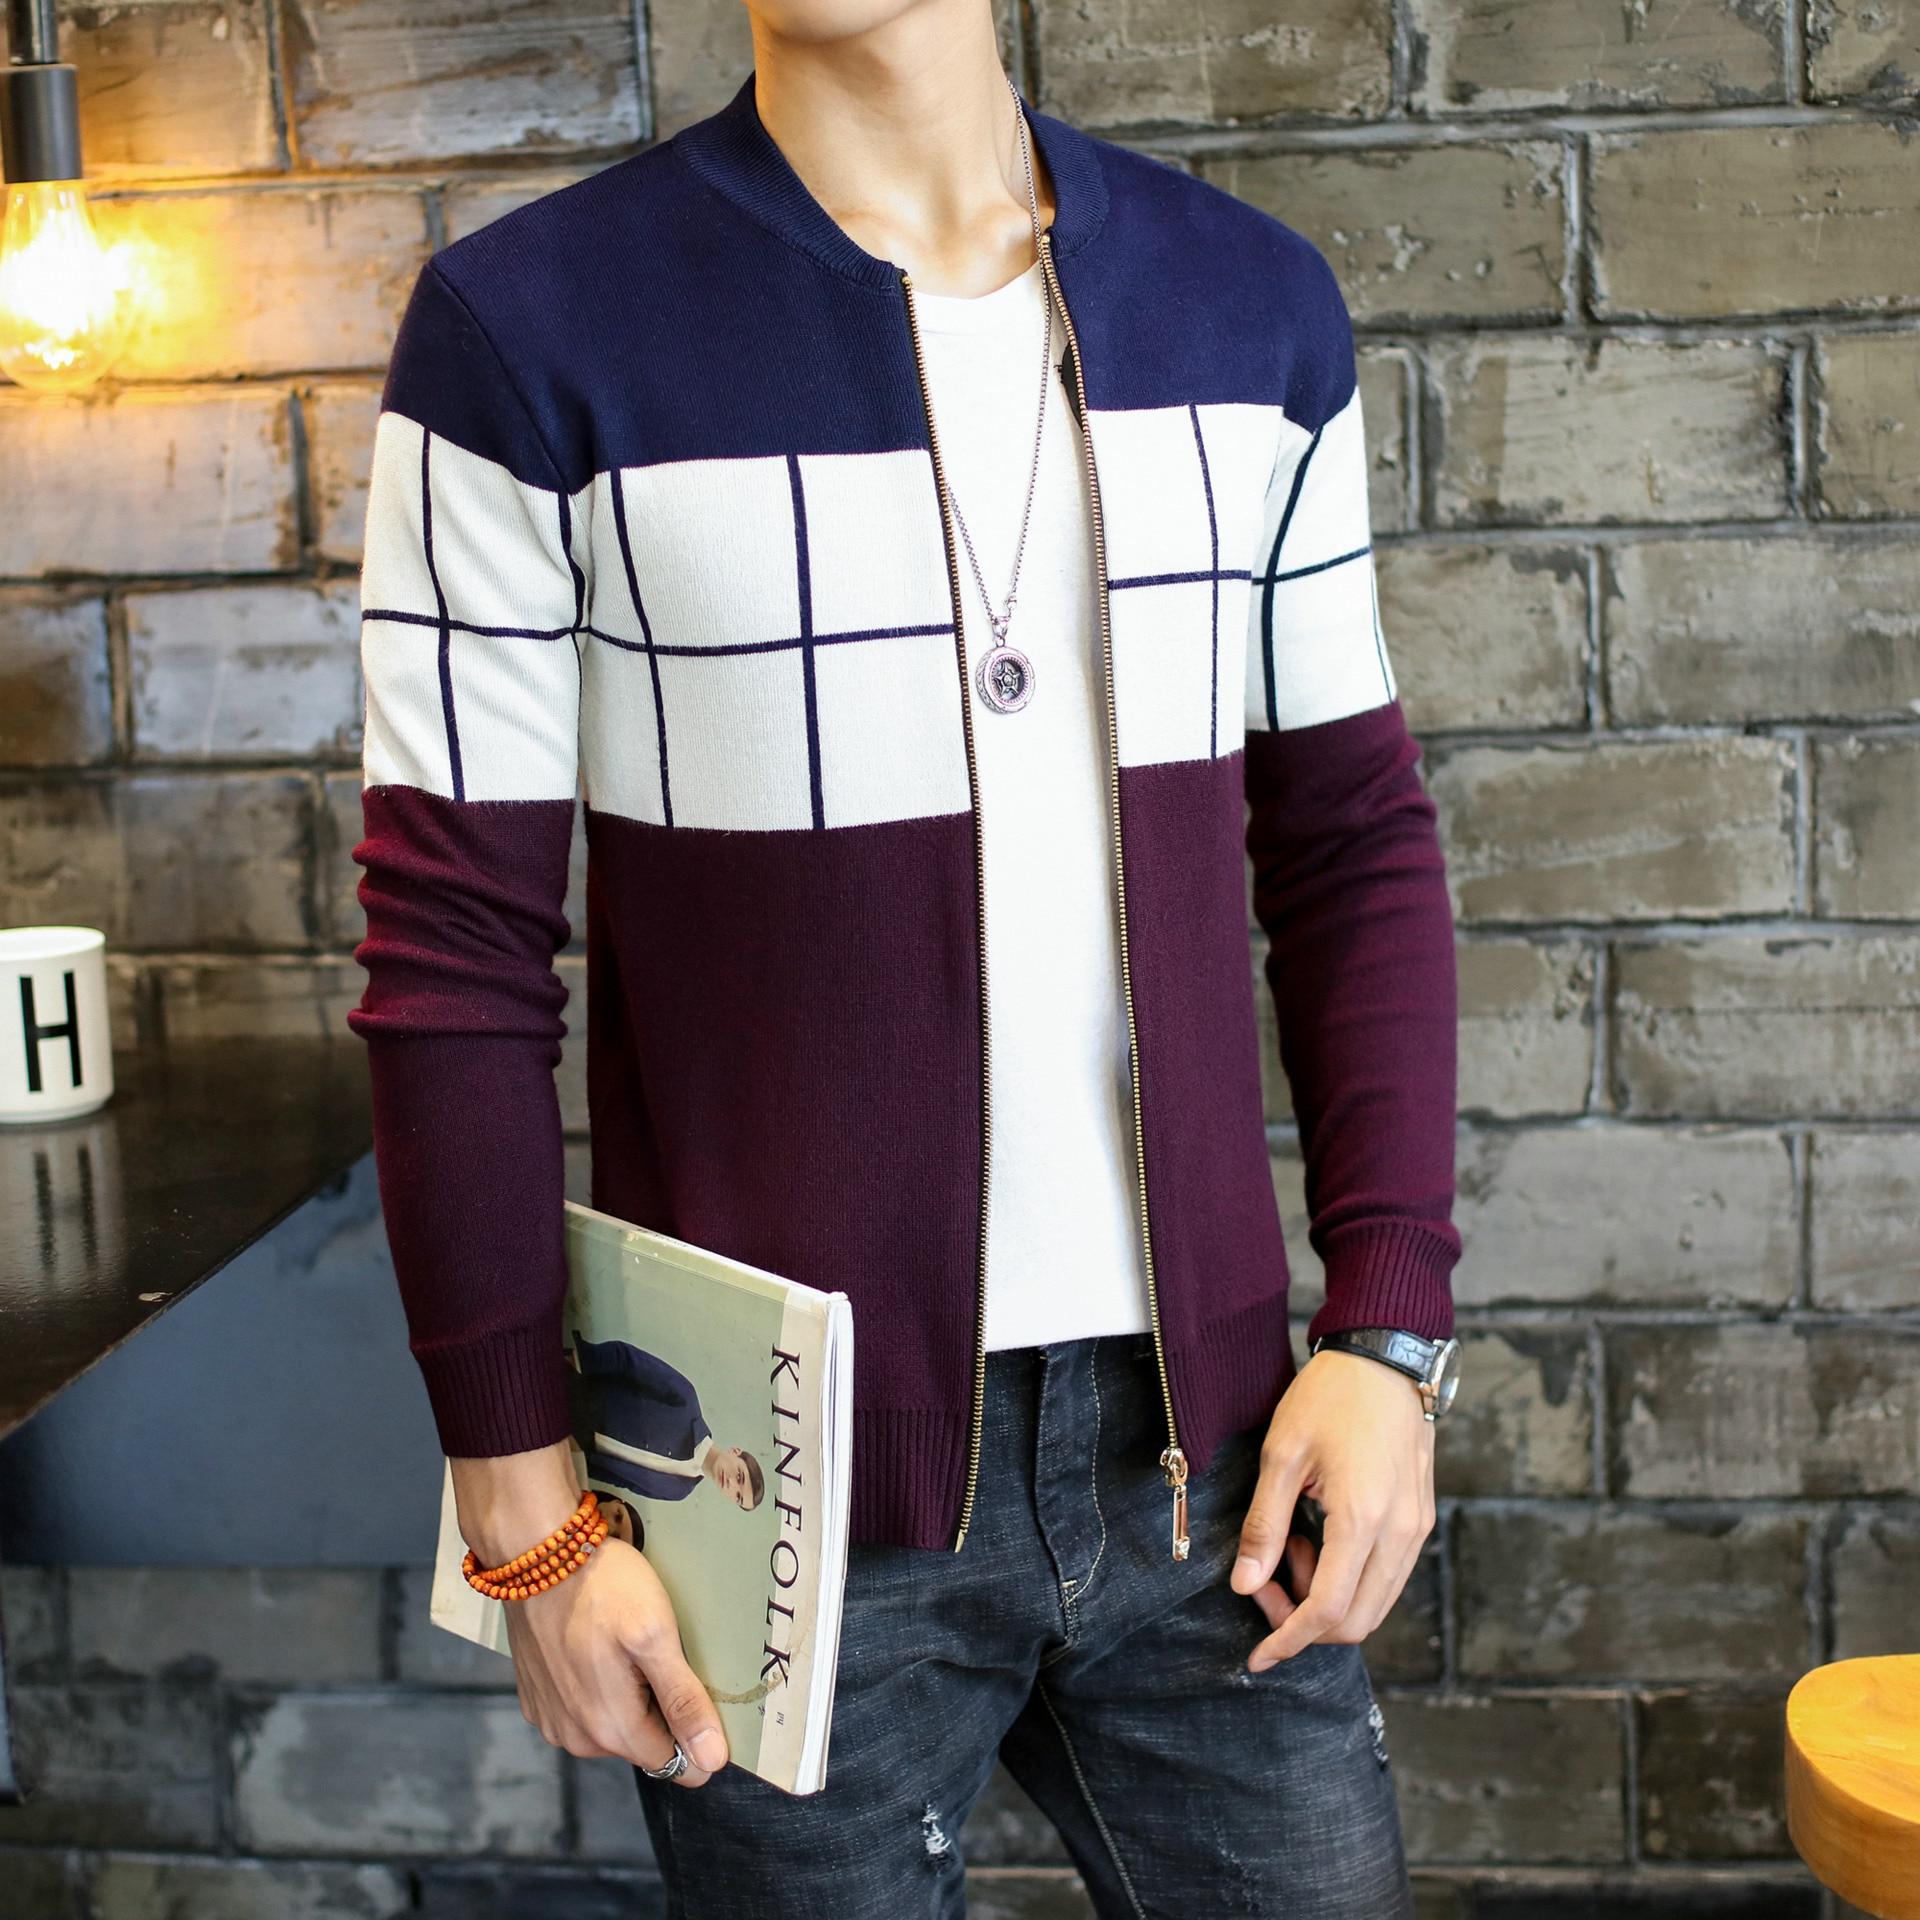 Sweater Autumn Winter Men Fashion Casual Warm X9-171019Z Nice Hot-Selling Wholesale Cheap